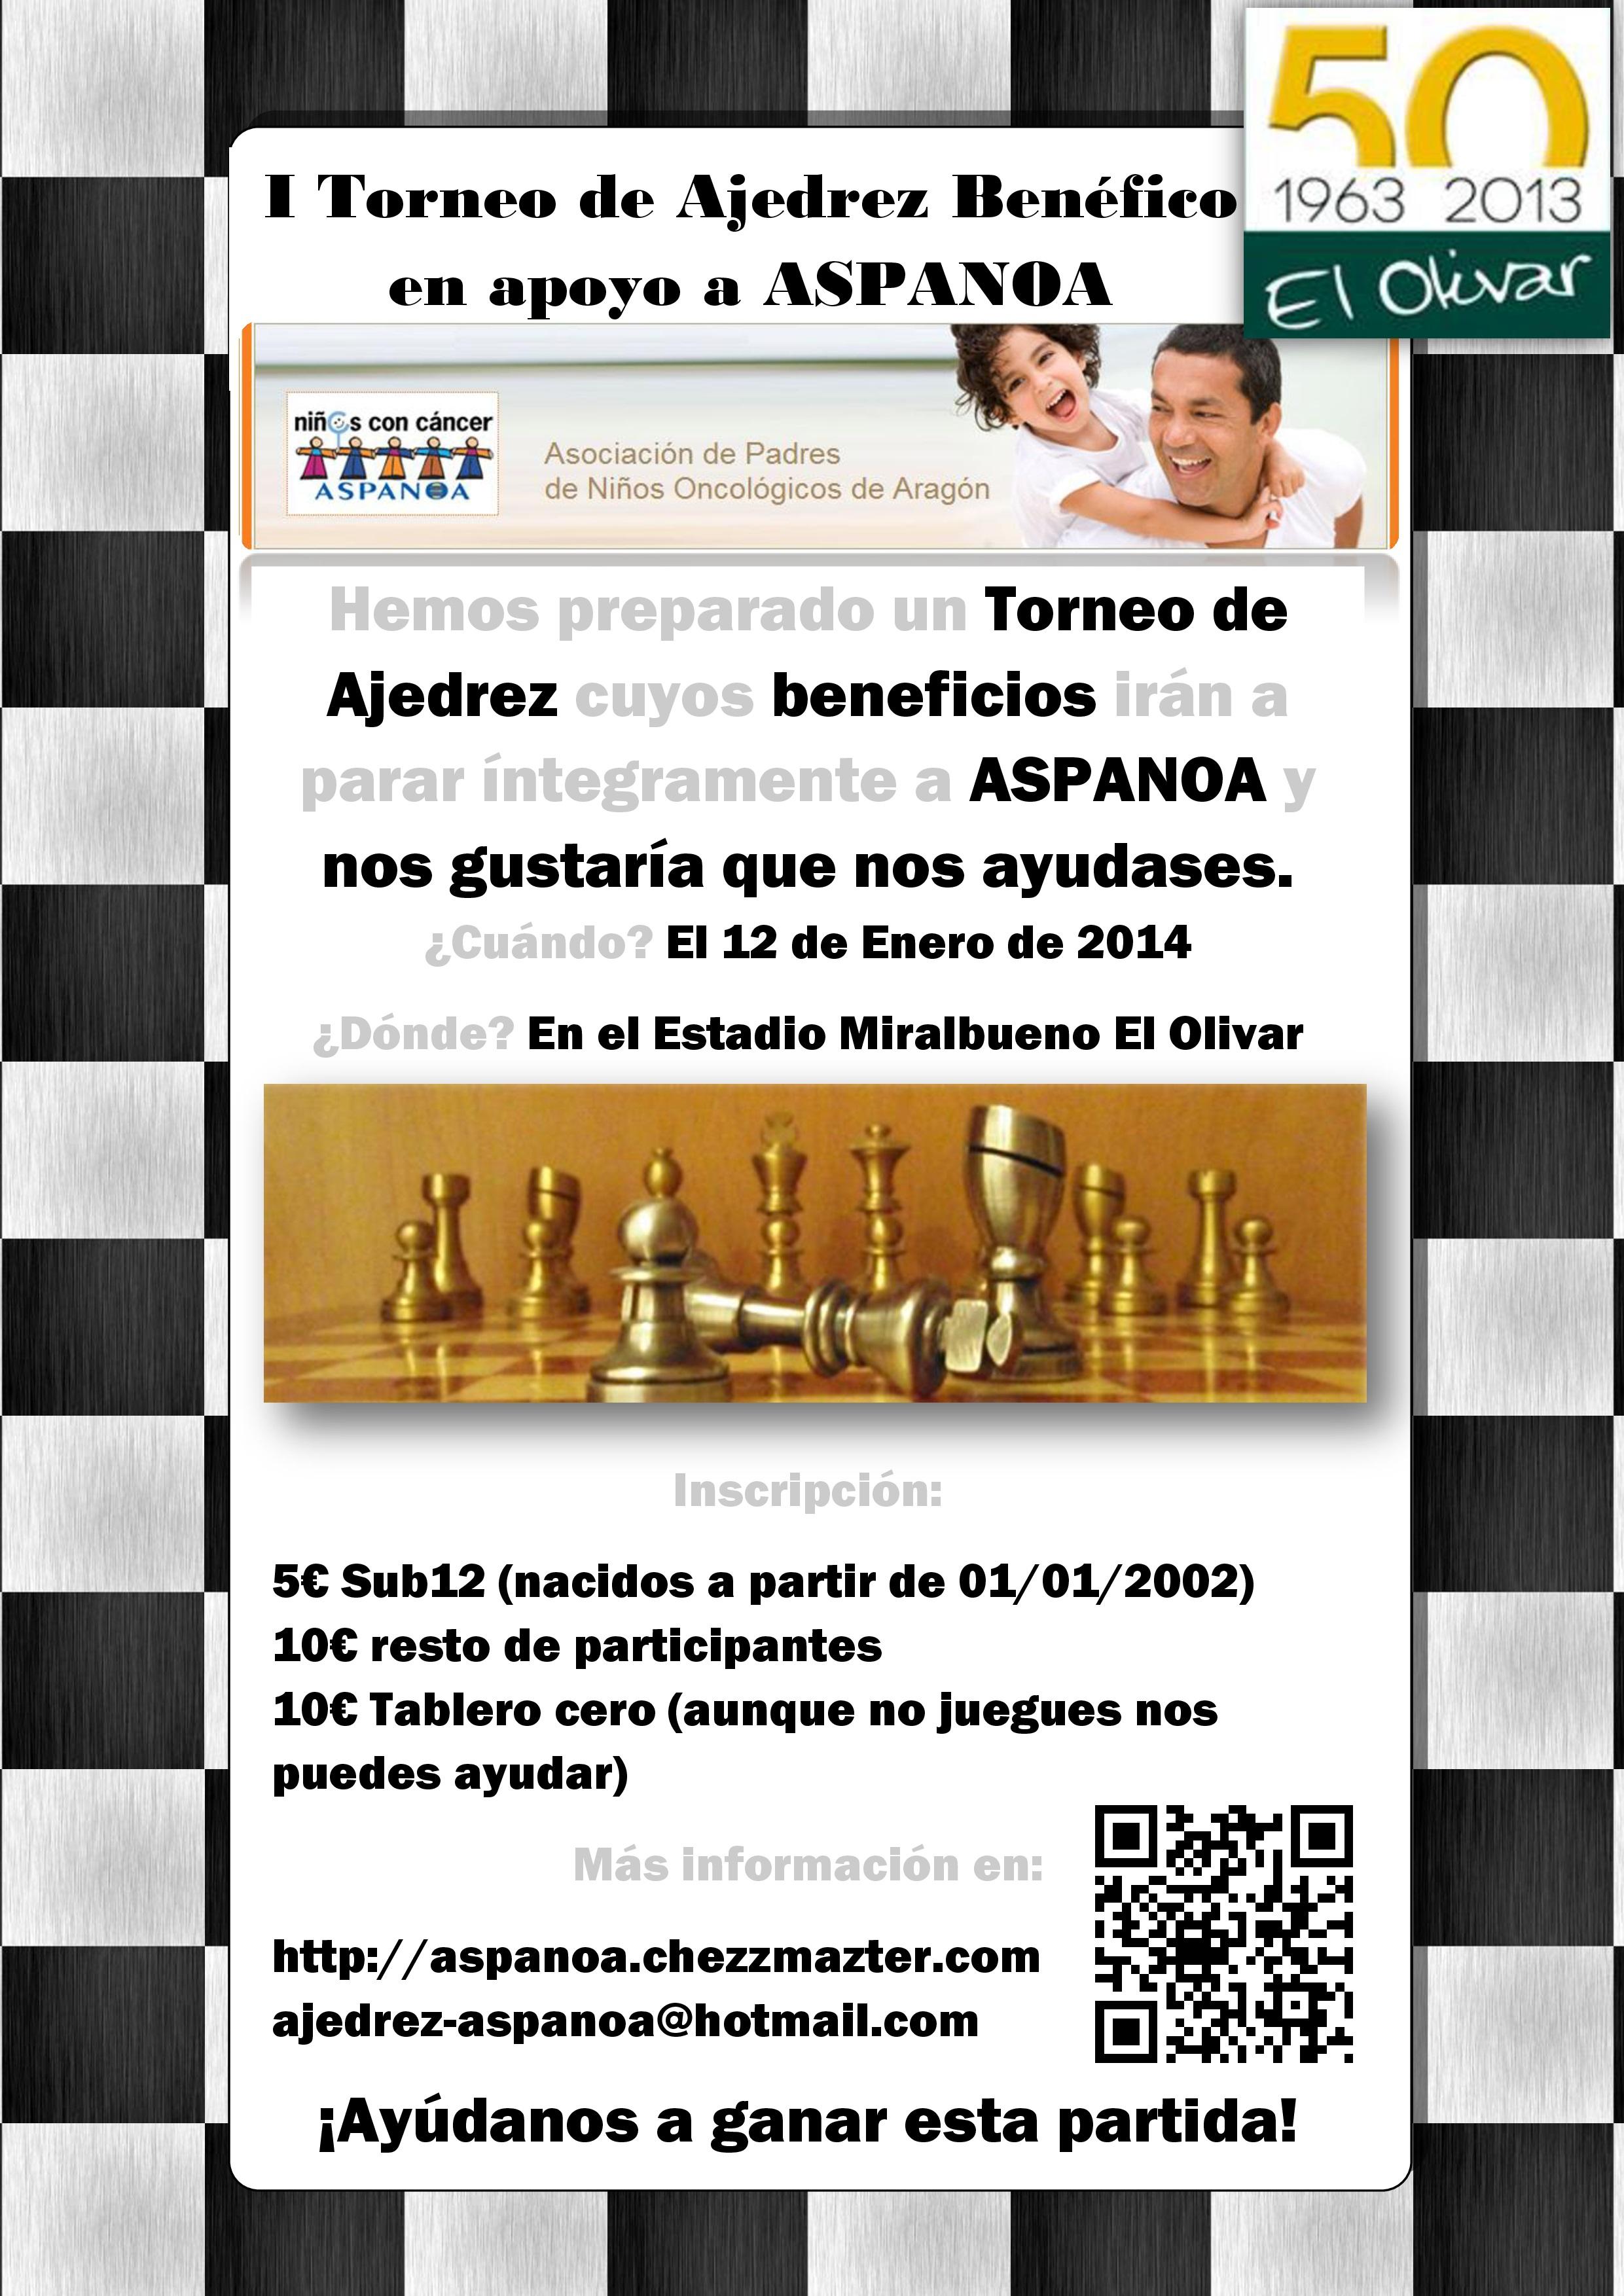 Cartel del Torneo de Ajedrez ASPANOA